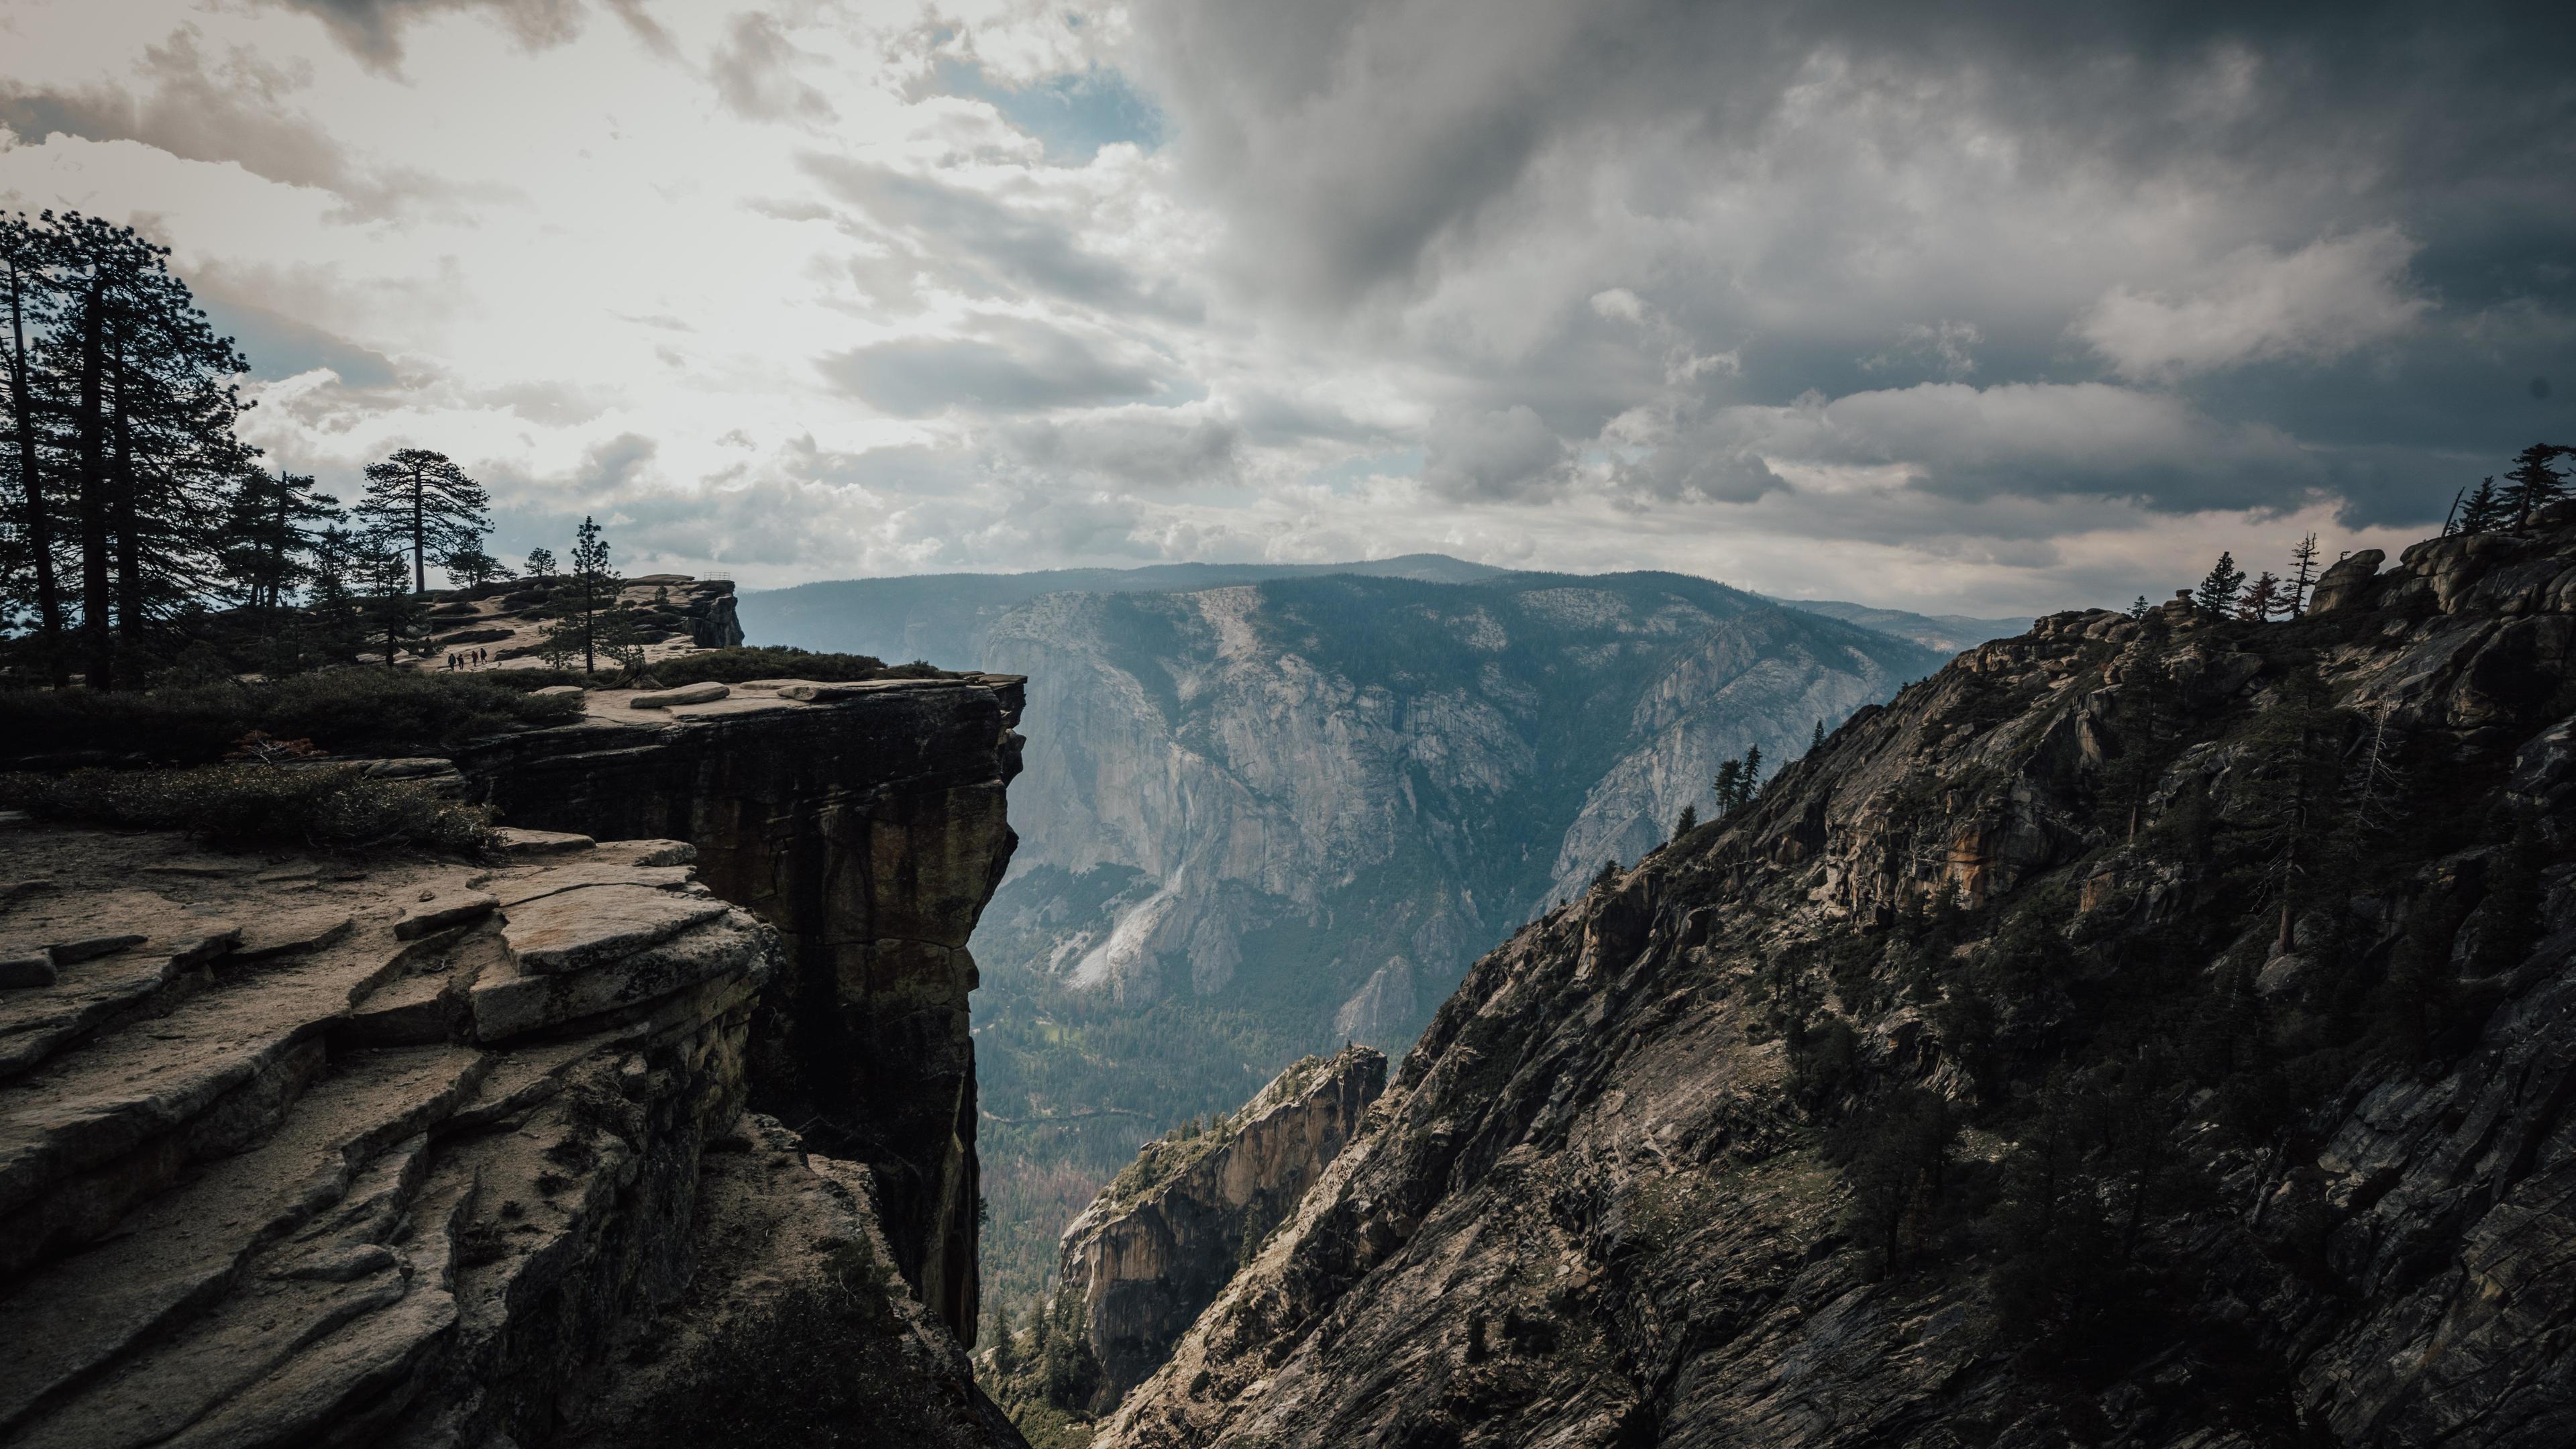 yosemite valley 4k 1551644559 - Yosemite Valley 4k - yosemite wallpapers, valley wallpapers, nature wallpapers, mountains wallpapers, hd-wallpapers, 4k-wallpapers